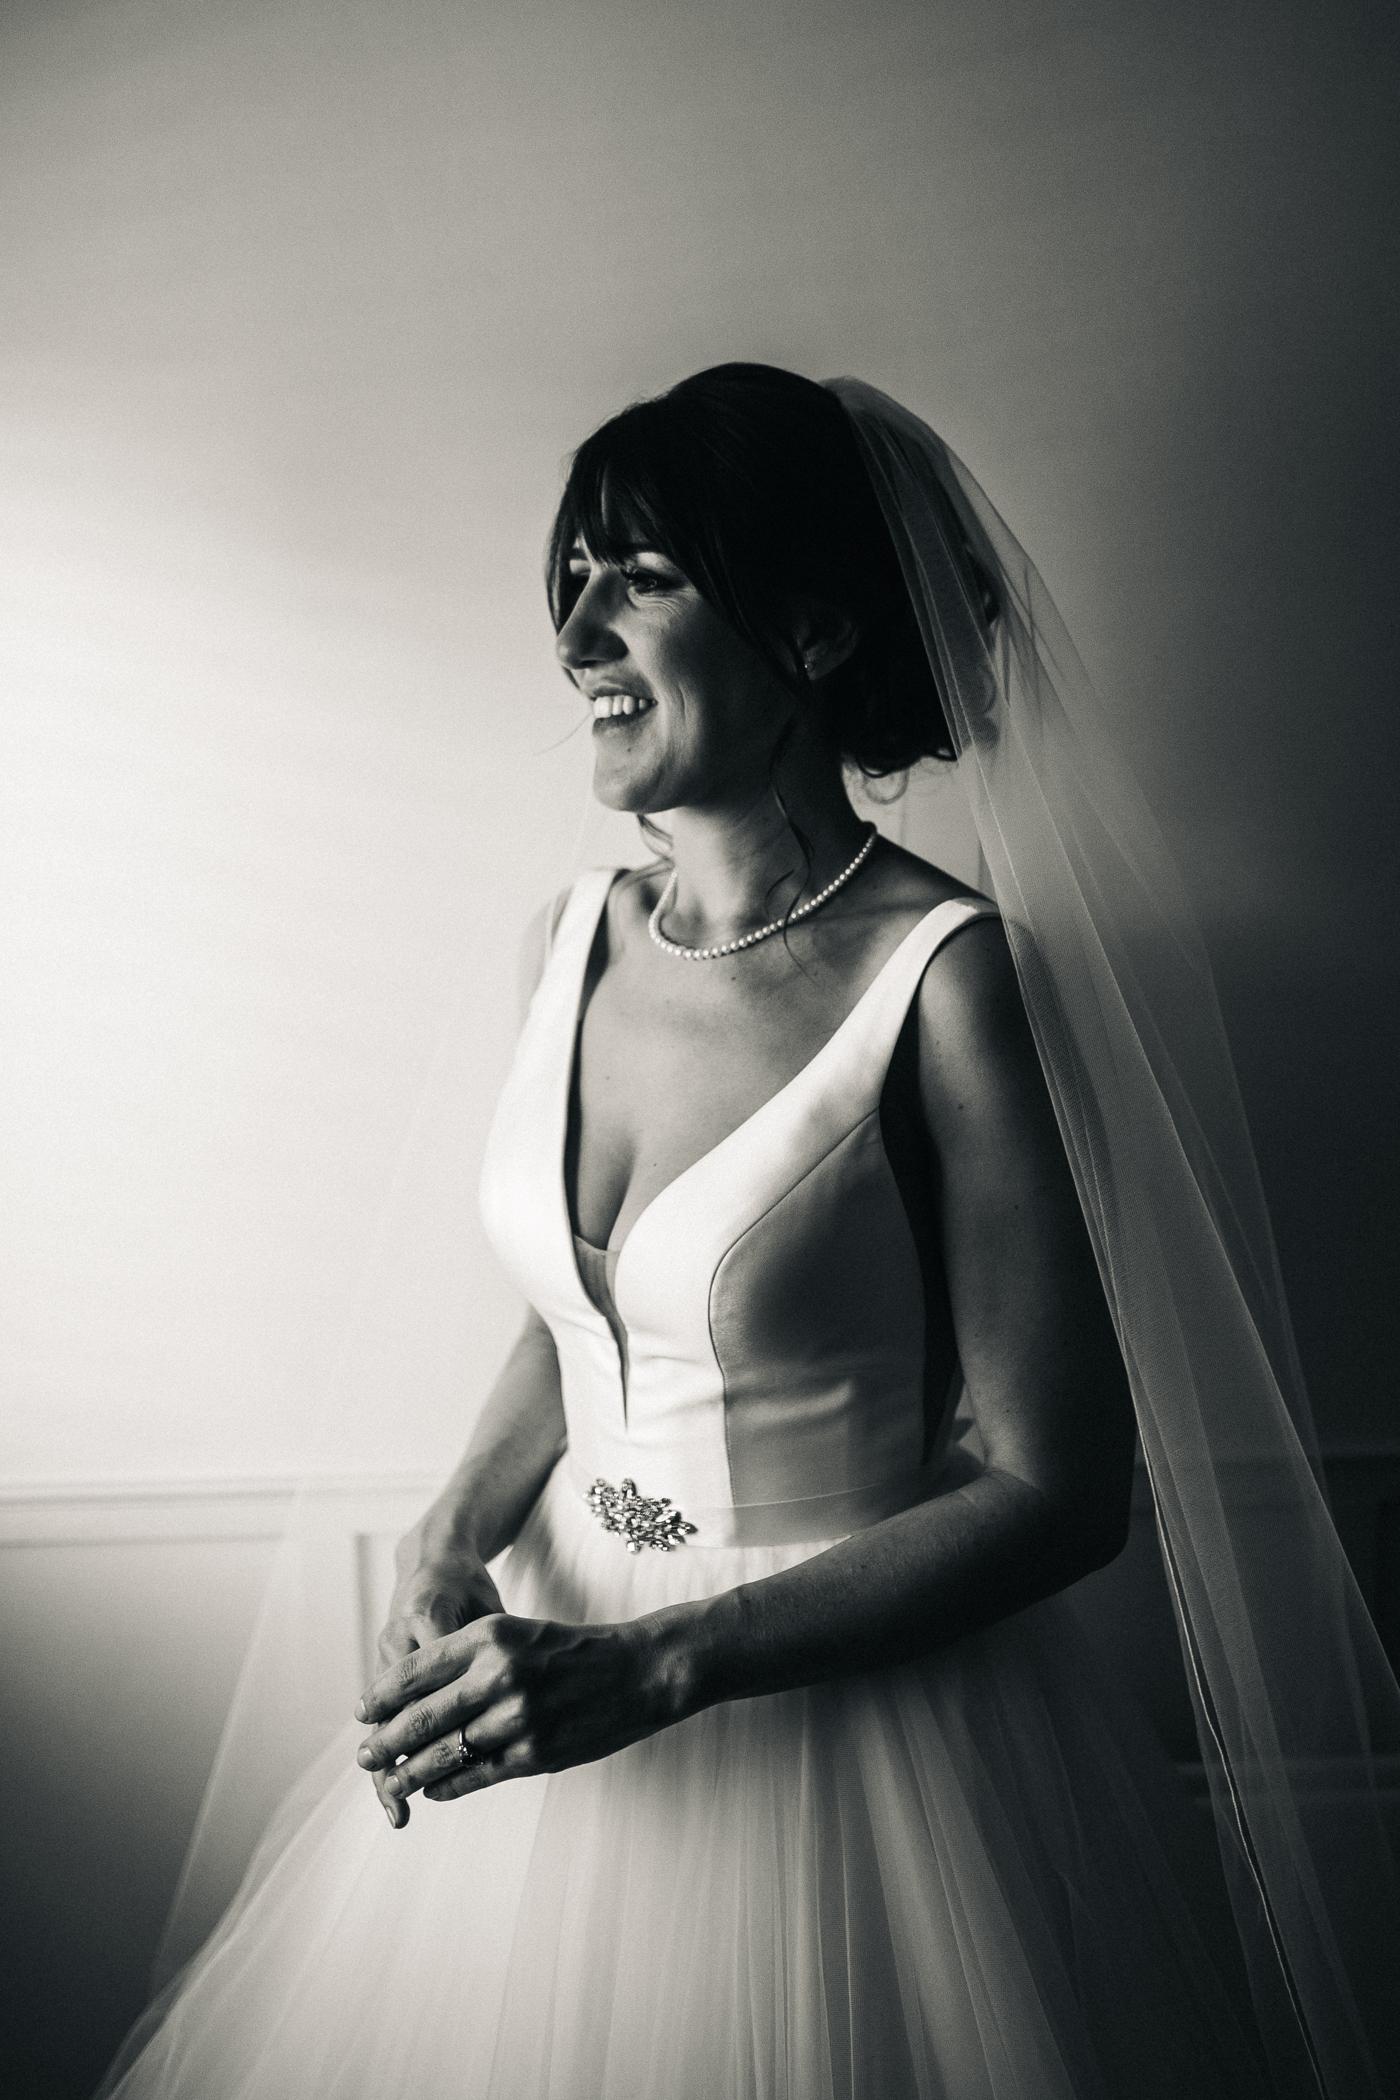 york-house-malton-wedding-photographer-north-yorkshire-0011.jpg